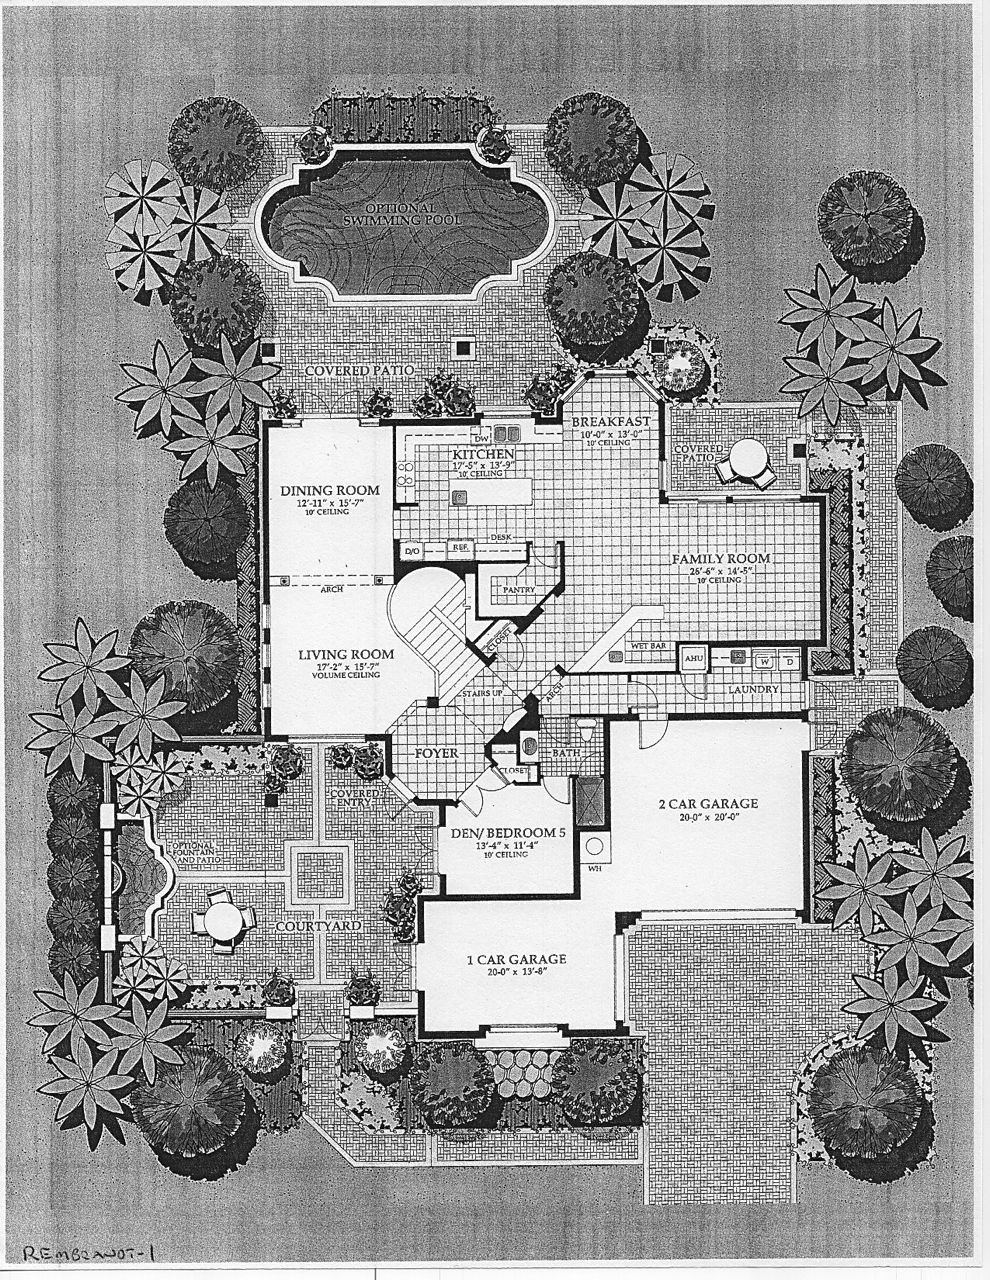 Highland ranch estates floor plans and community for Rembrandt homes floor plans